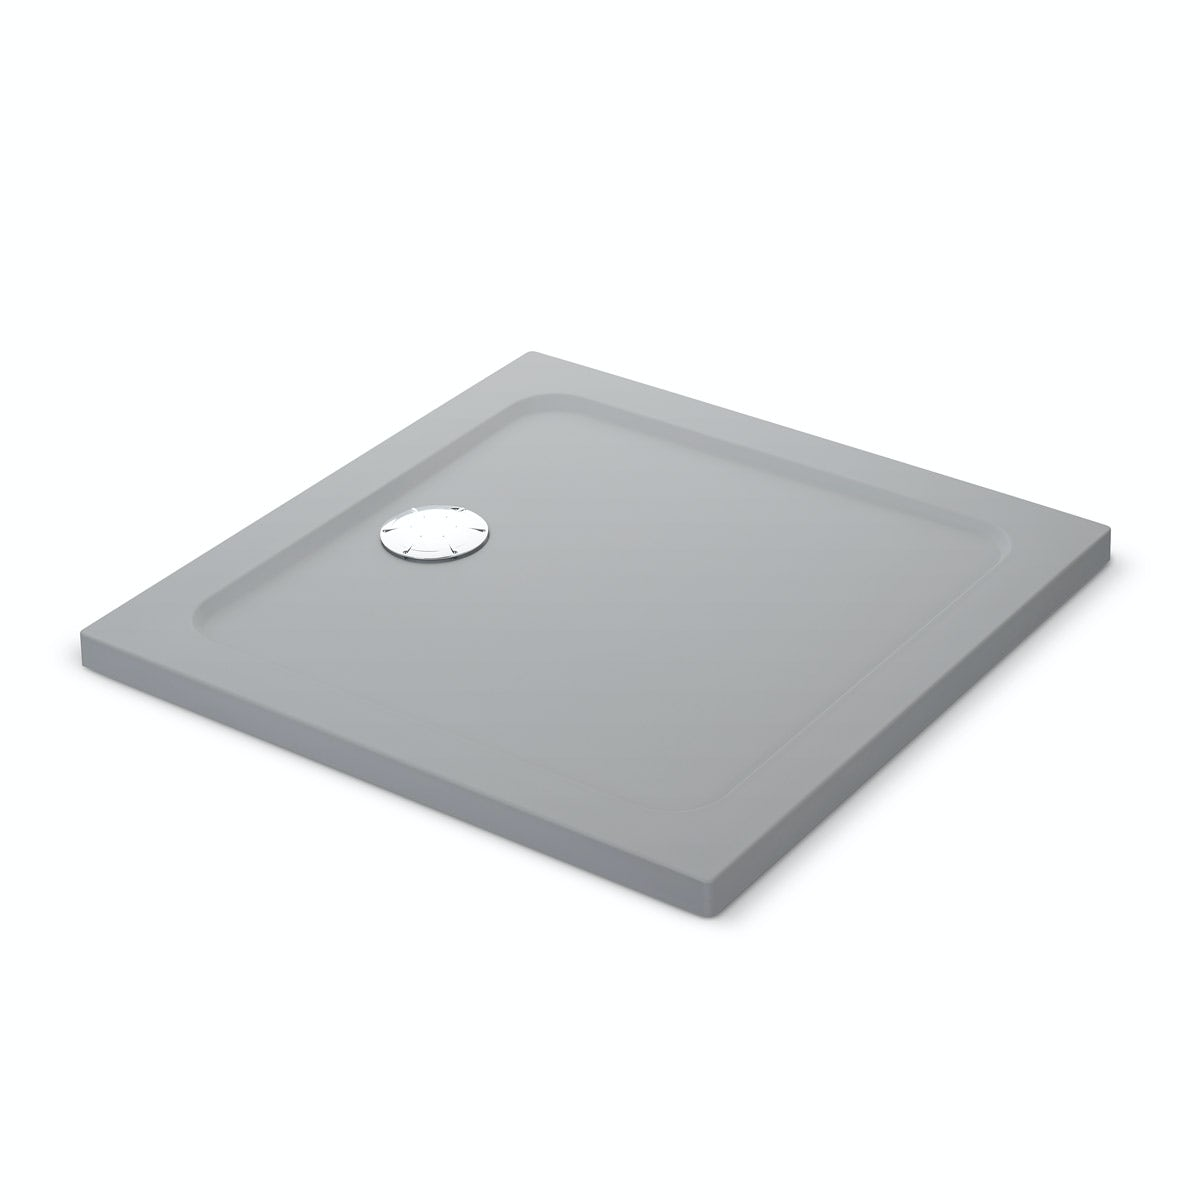 Mira Flight Safe Low Level Anti Slip Square Shower Tray